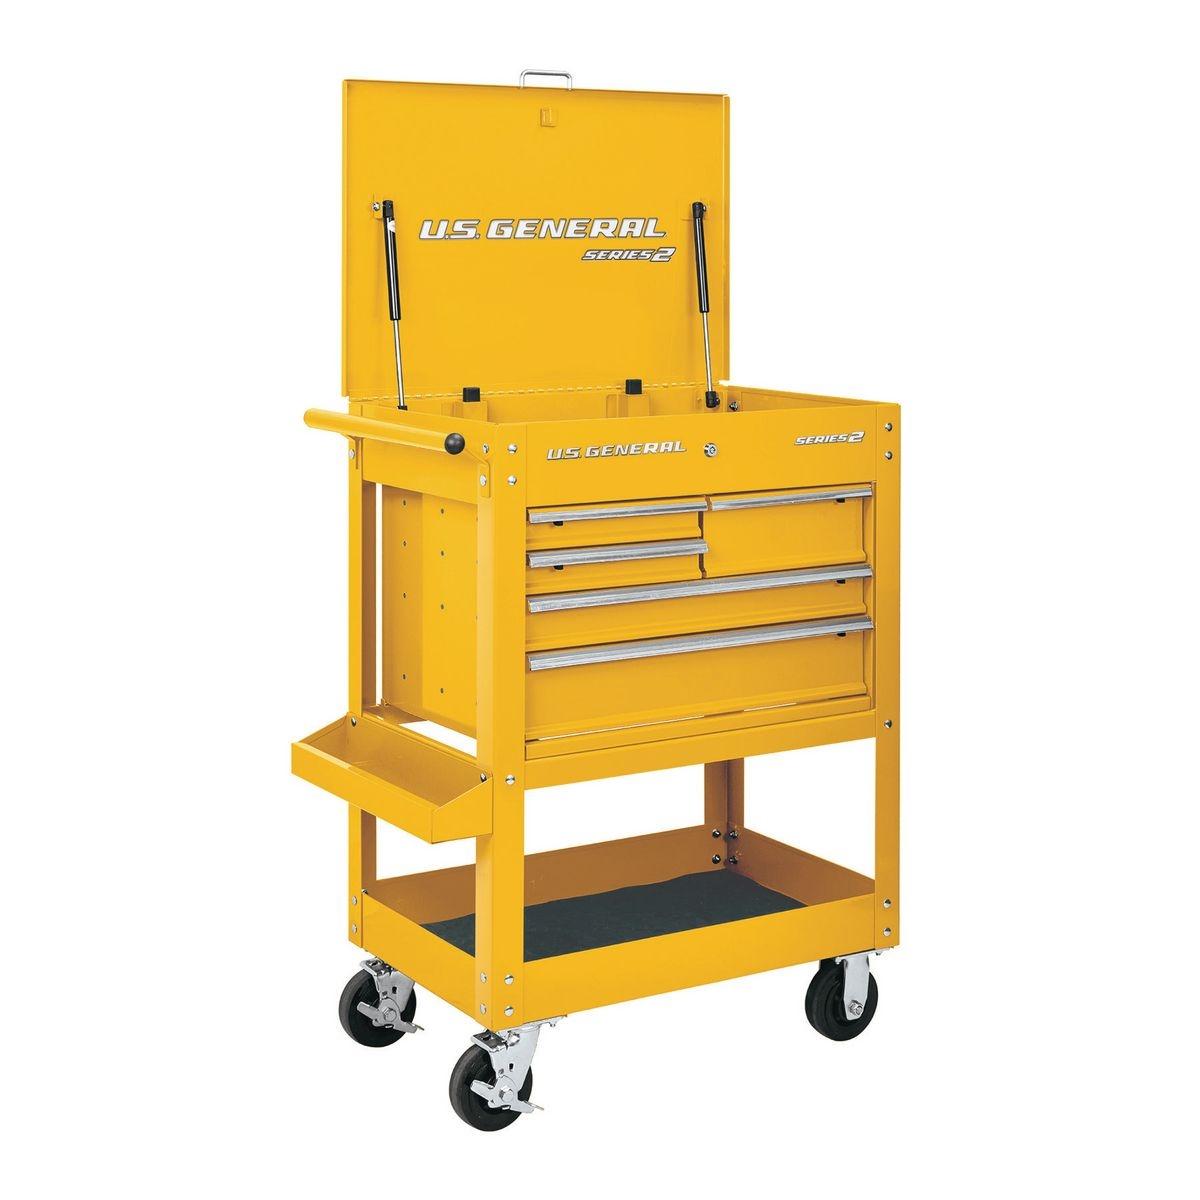 U.S. GENERAL 30 In. 5 Drawer Mechanic's Cart - Yellow - Item 64720 / 56239